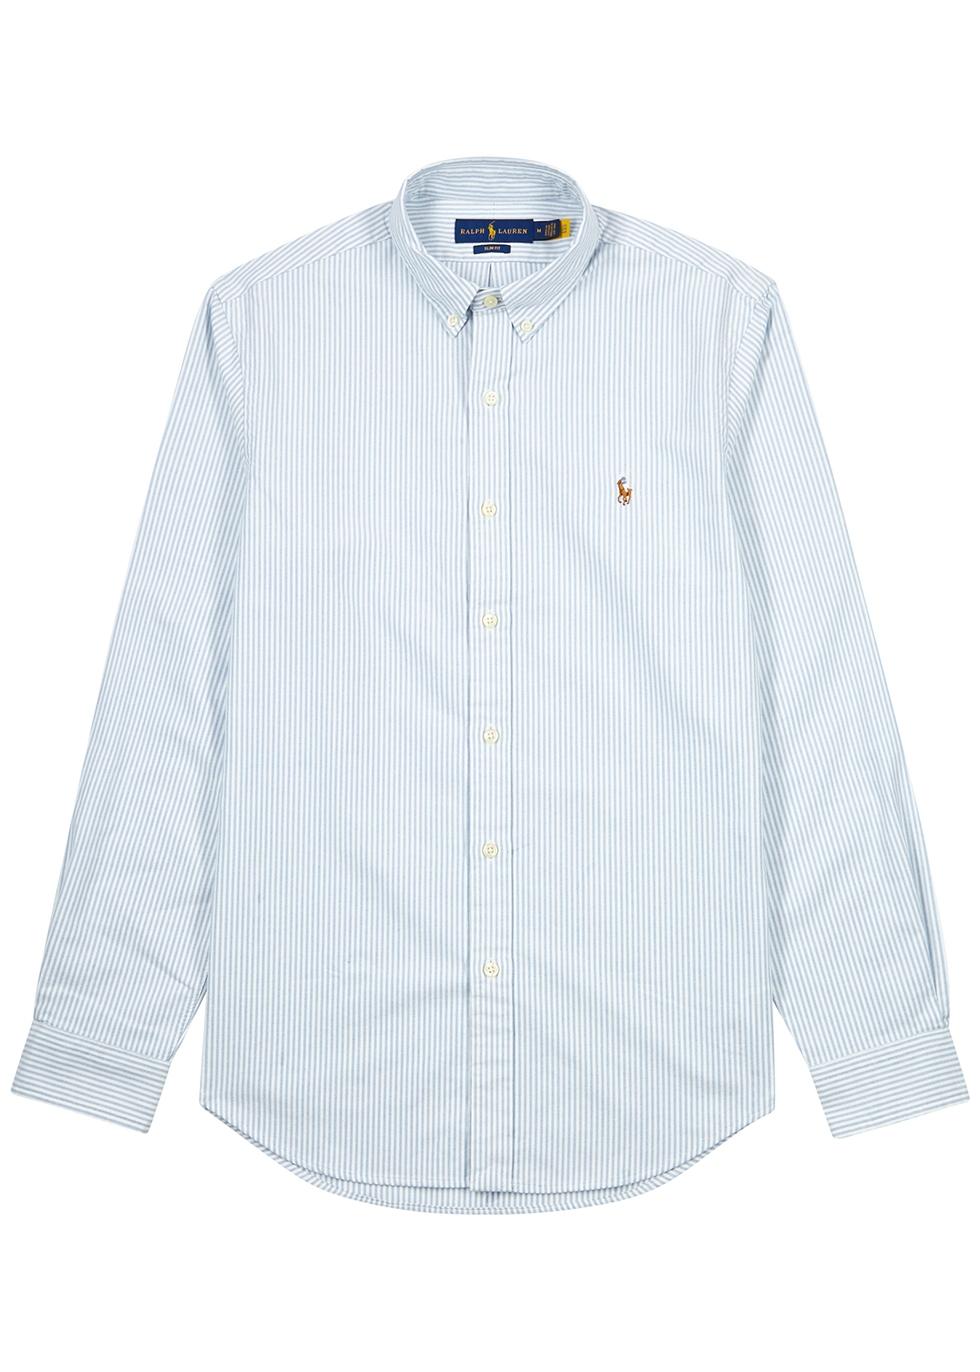 Striped piqué cotton Oxford shirt